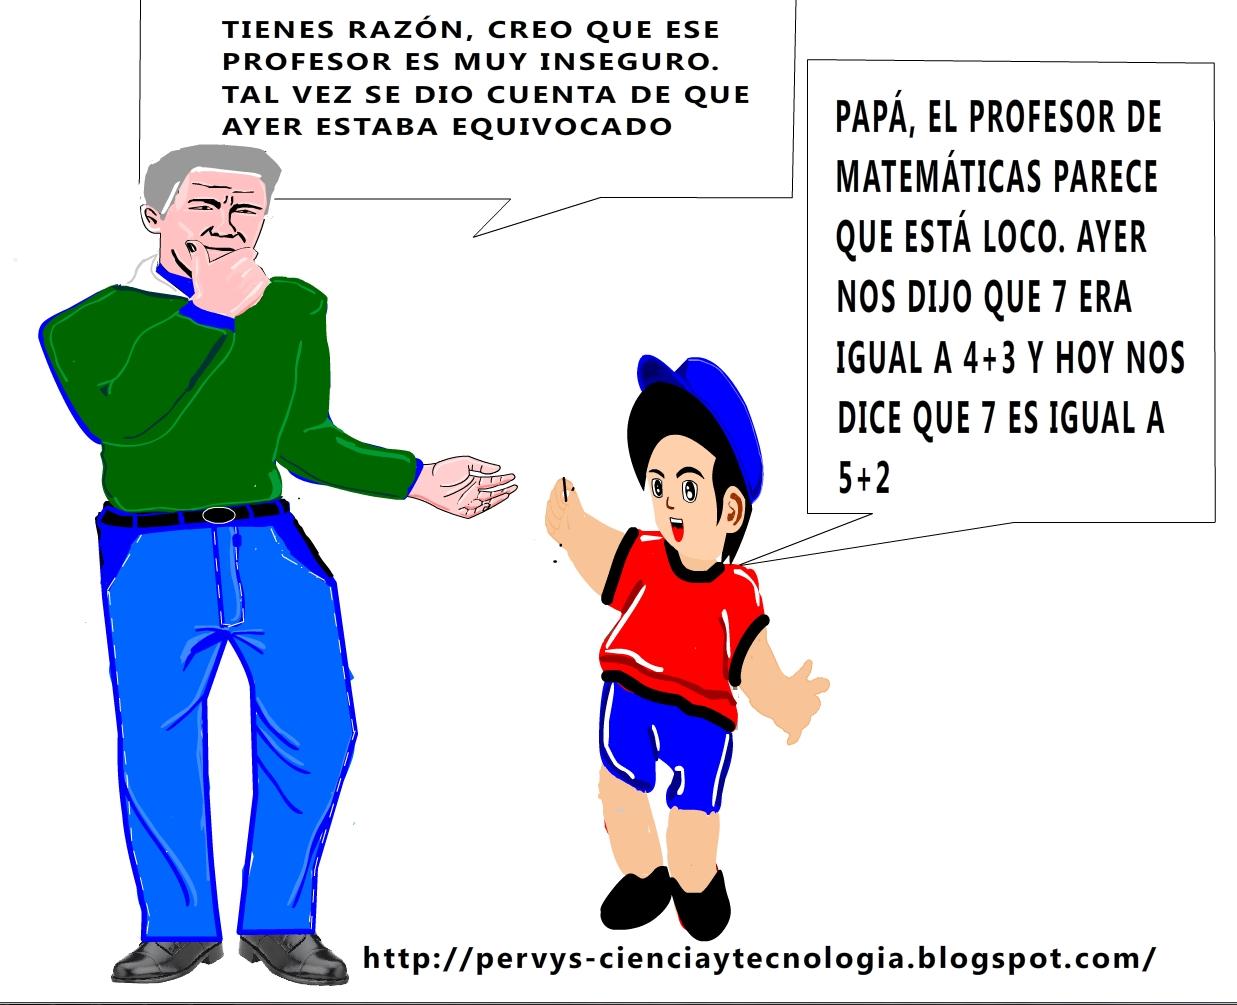 CHISTE GRÁFICO: MI PROFESOR DE MATEMÁTICAS ESTÁ LOCO